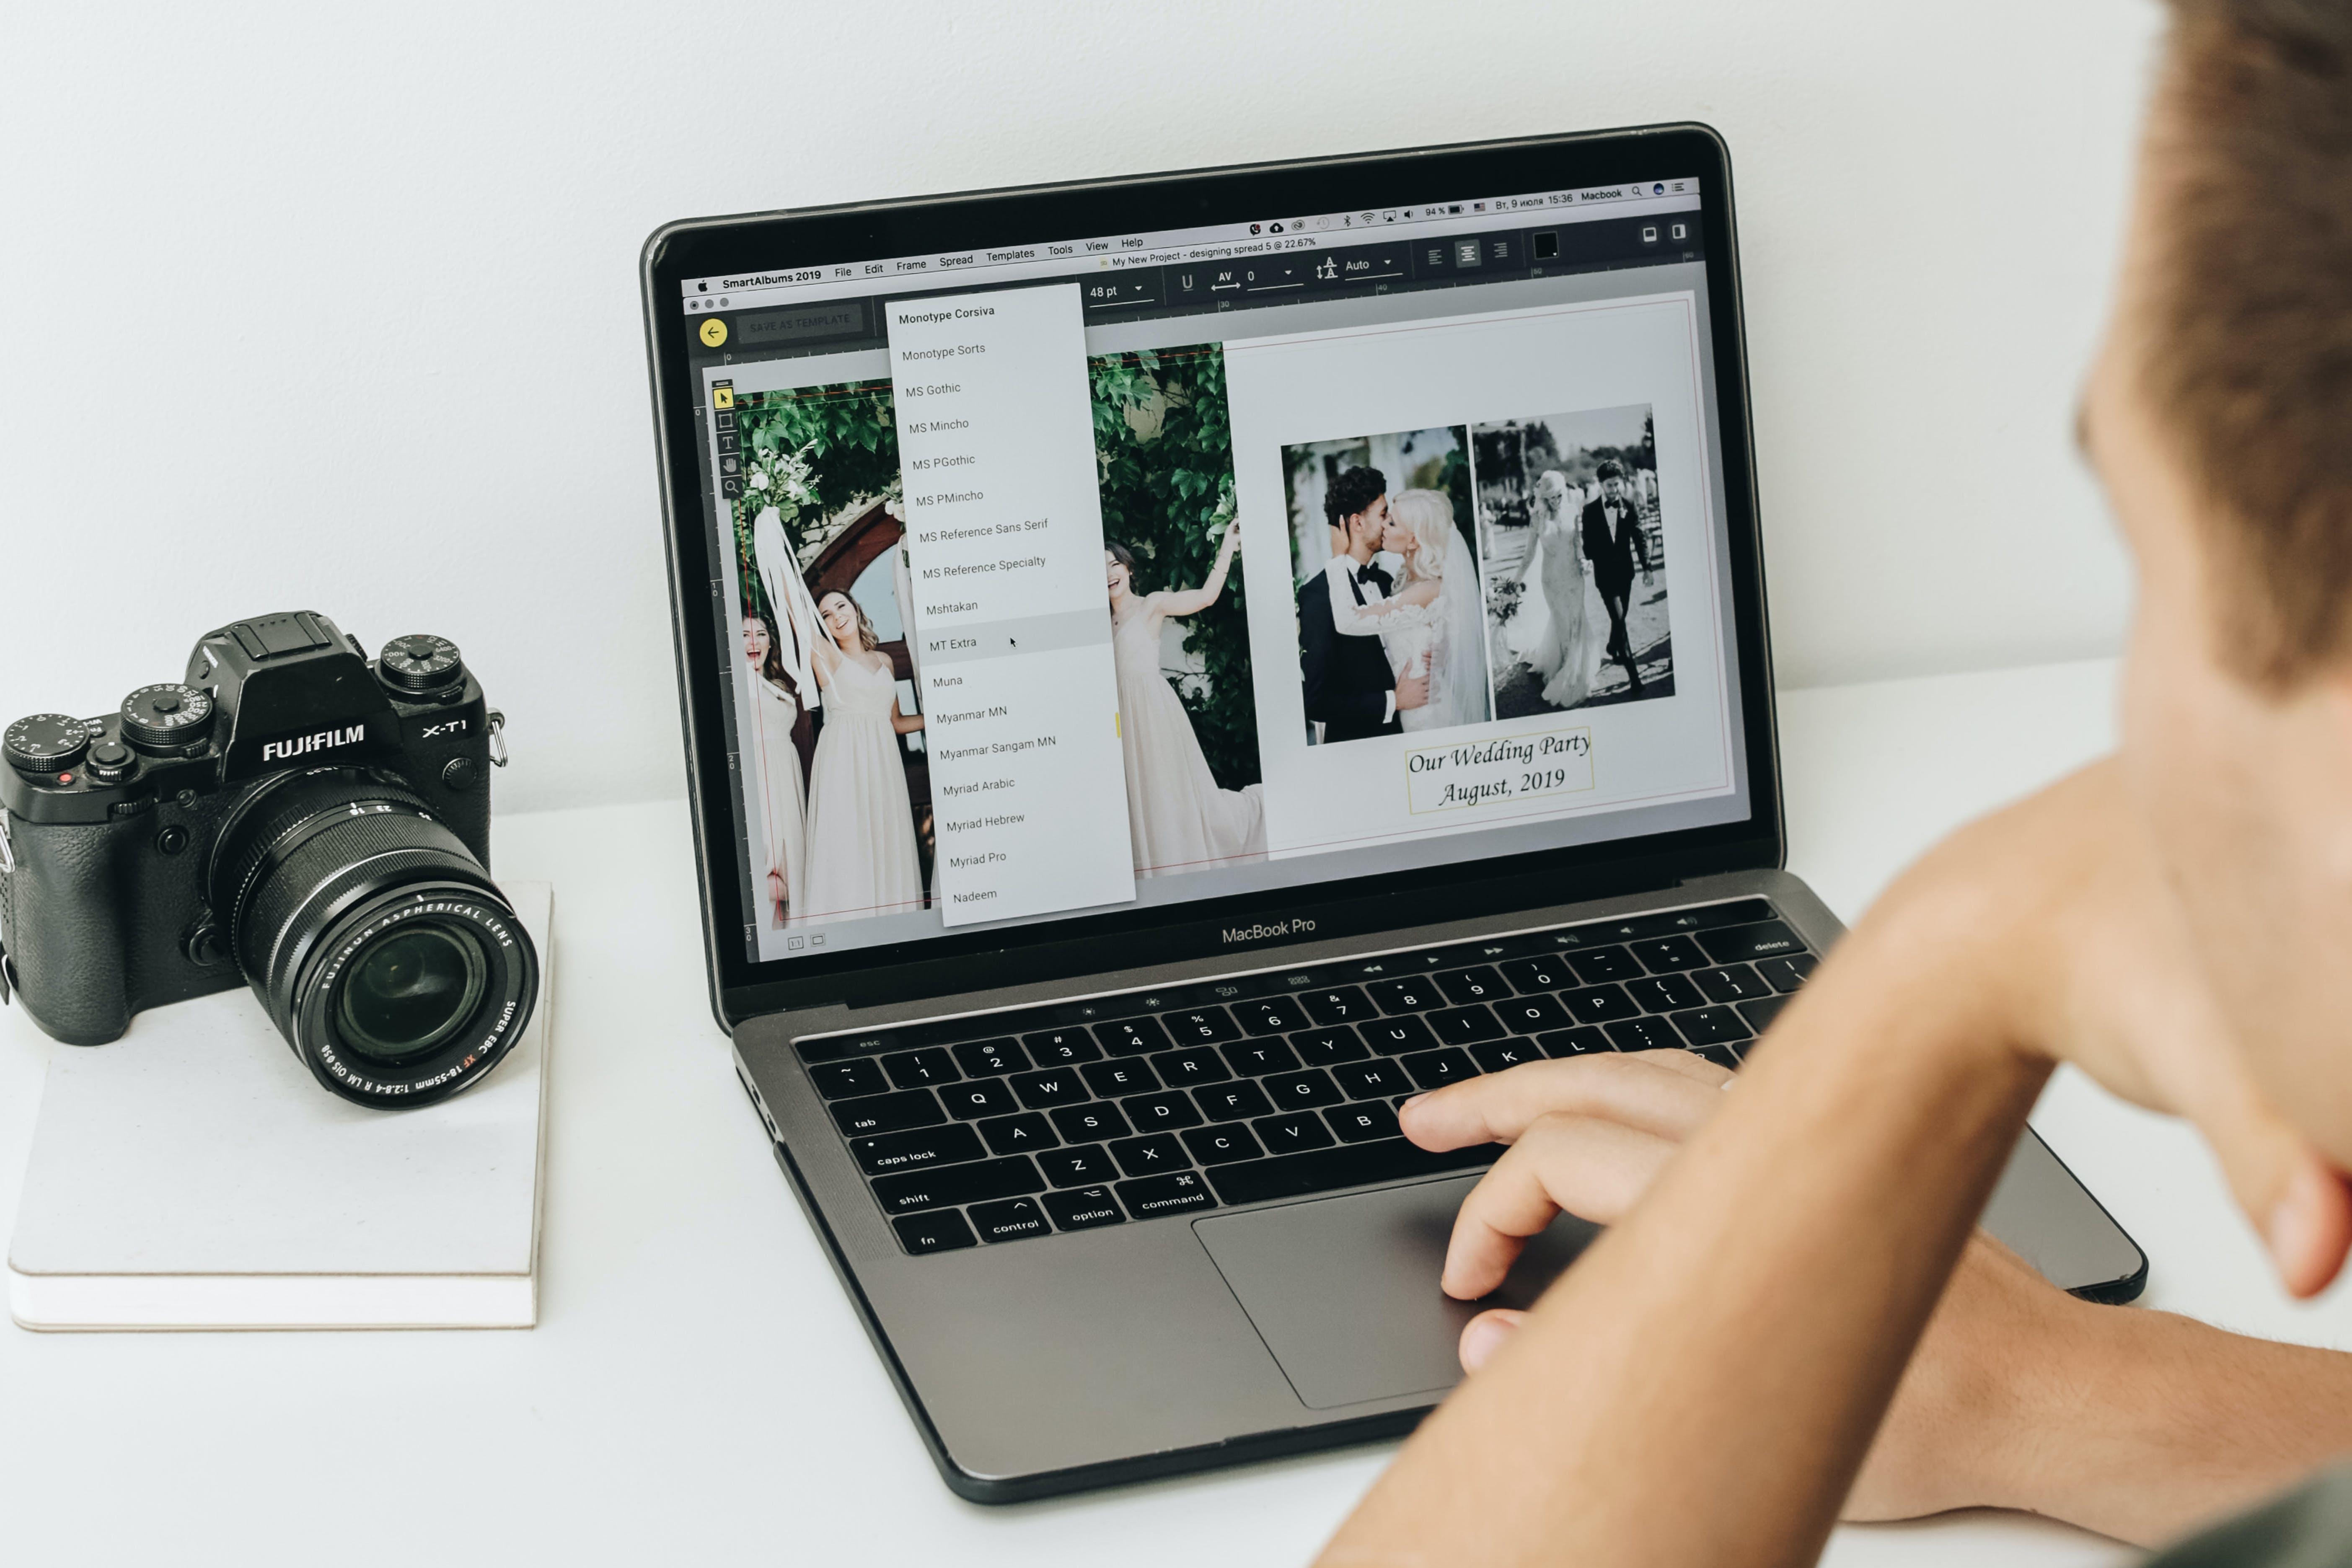 Wedding photographer using SmartAlbums 2019 to design photo album for clients